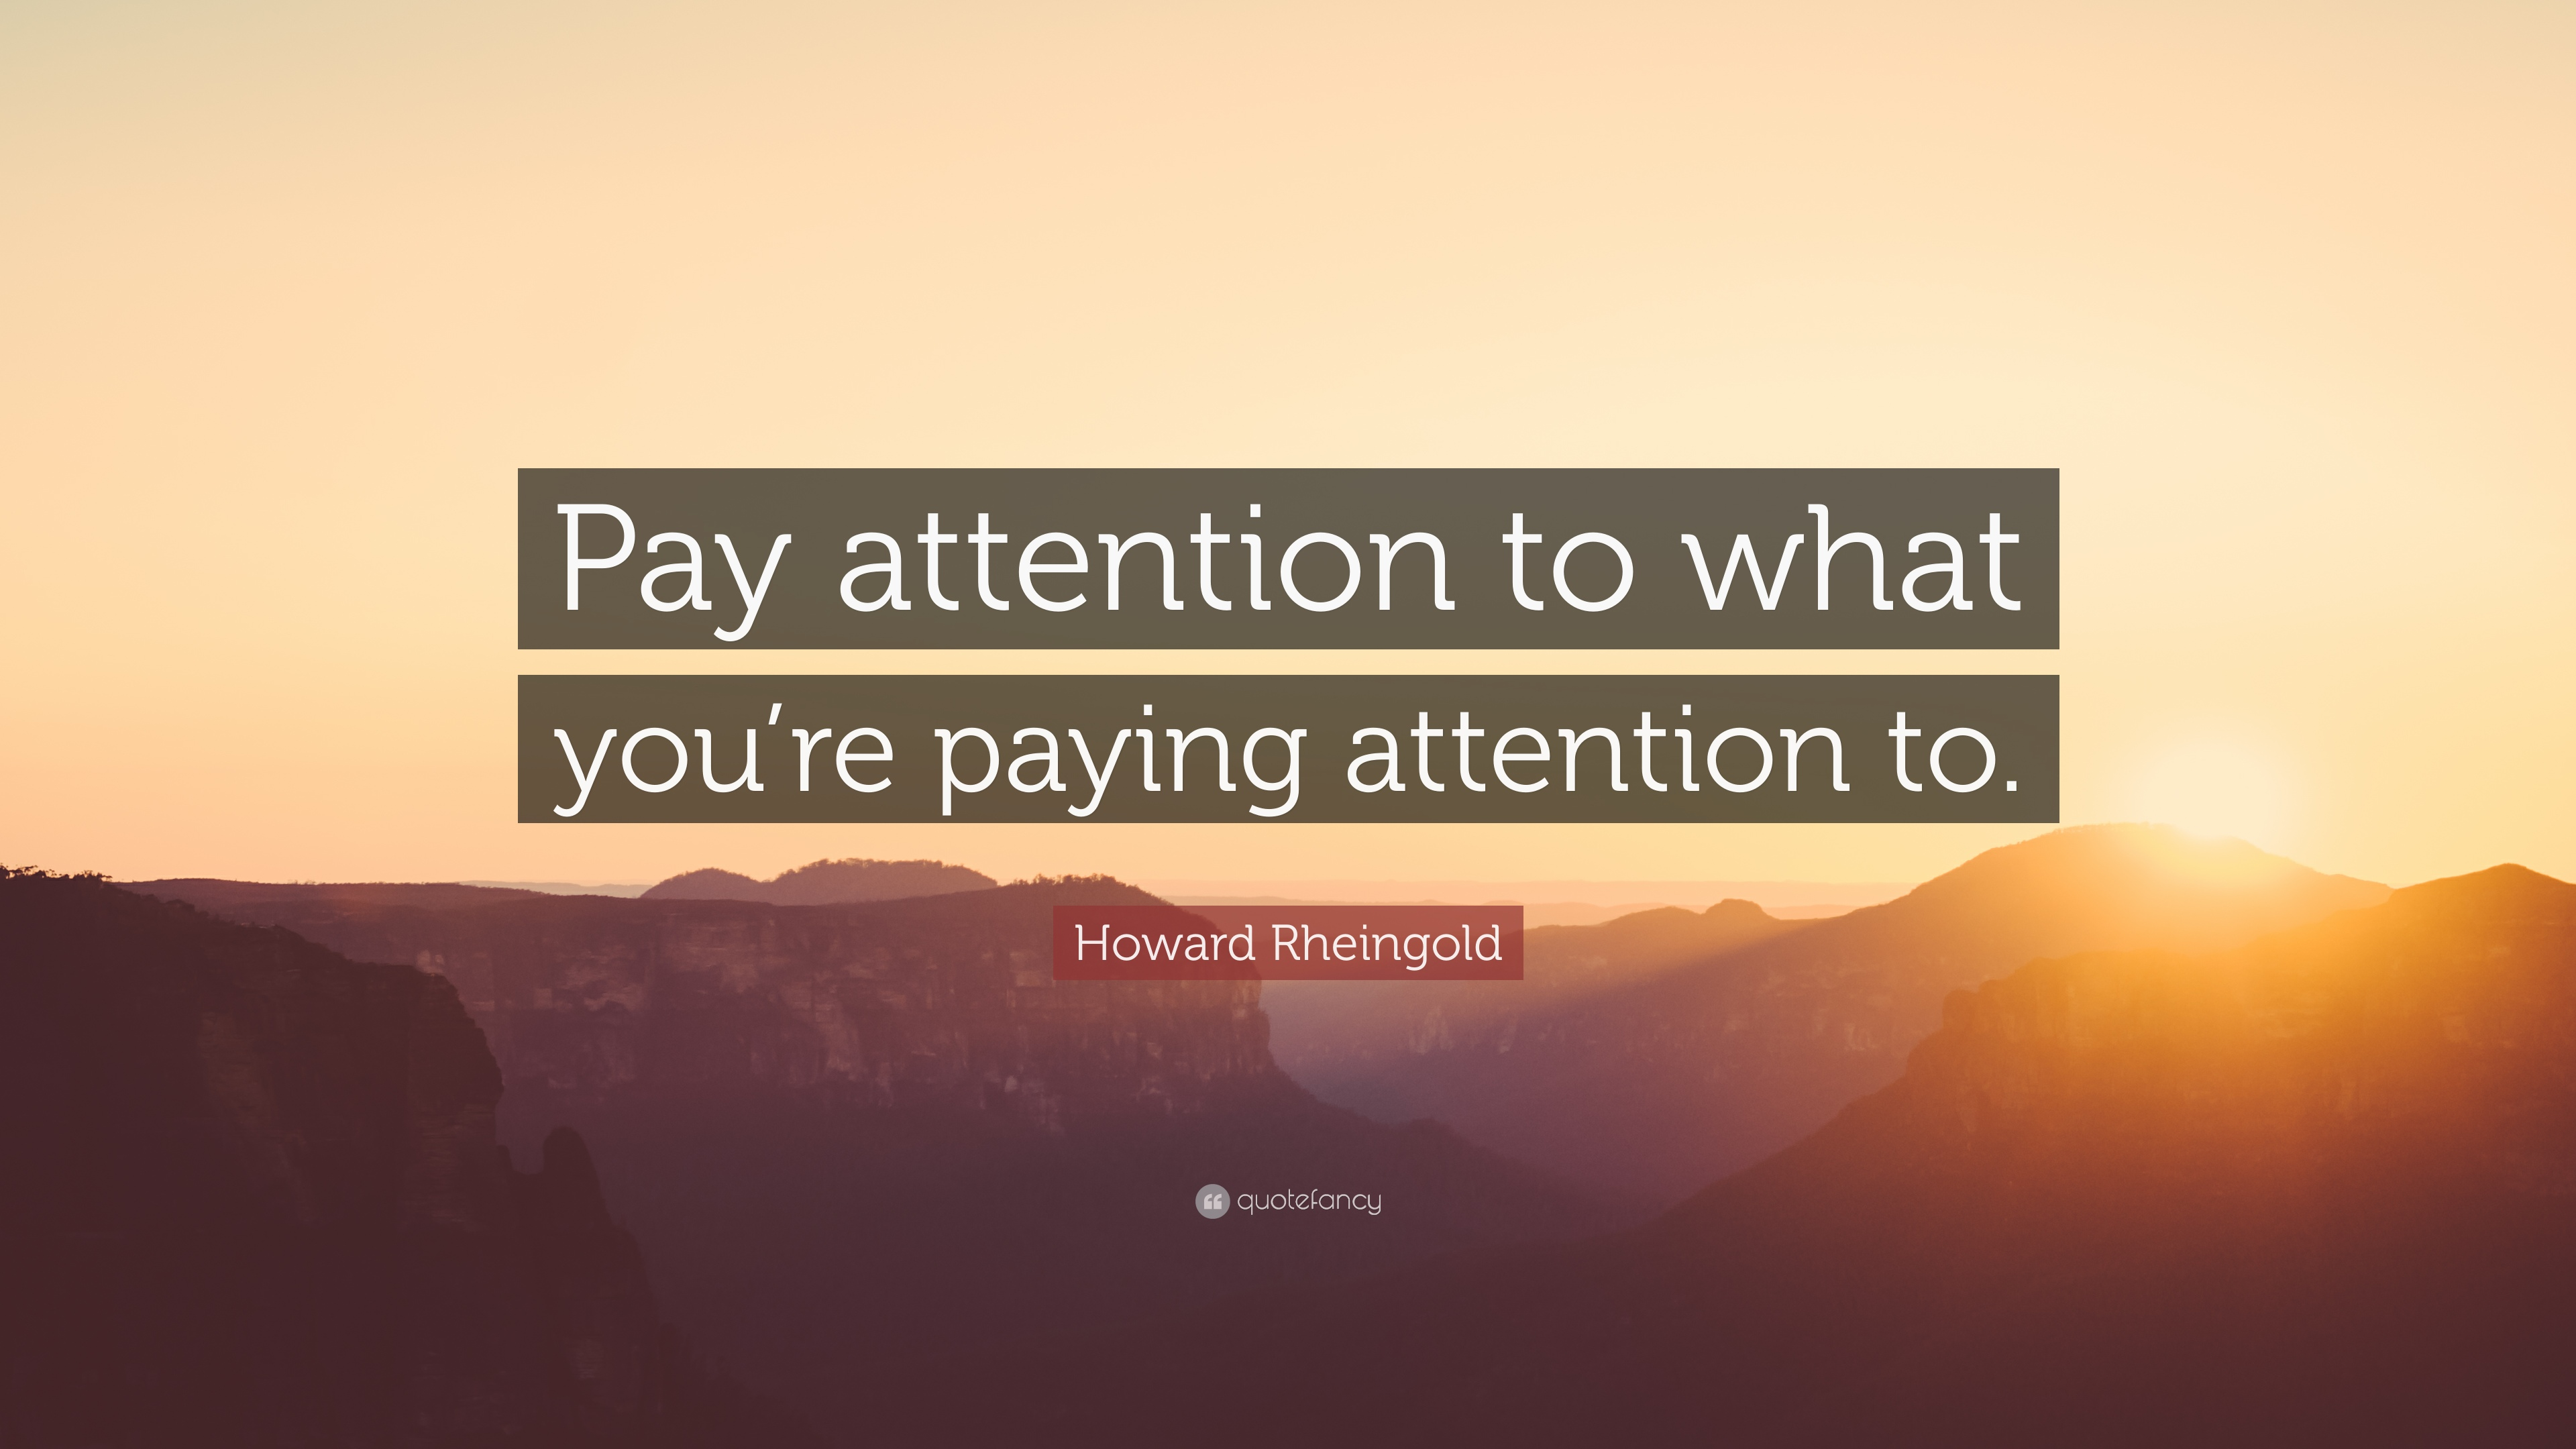 Howard Rheingold Quotes (49 wallpapers) - Quotefancy